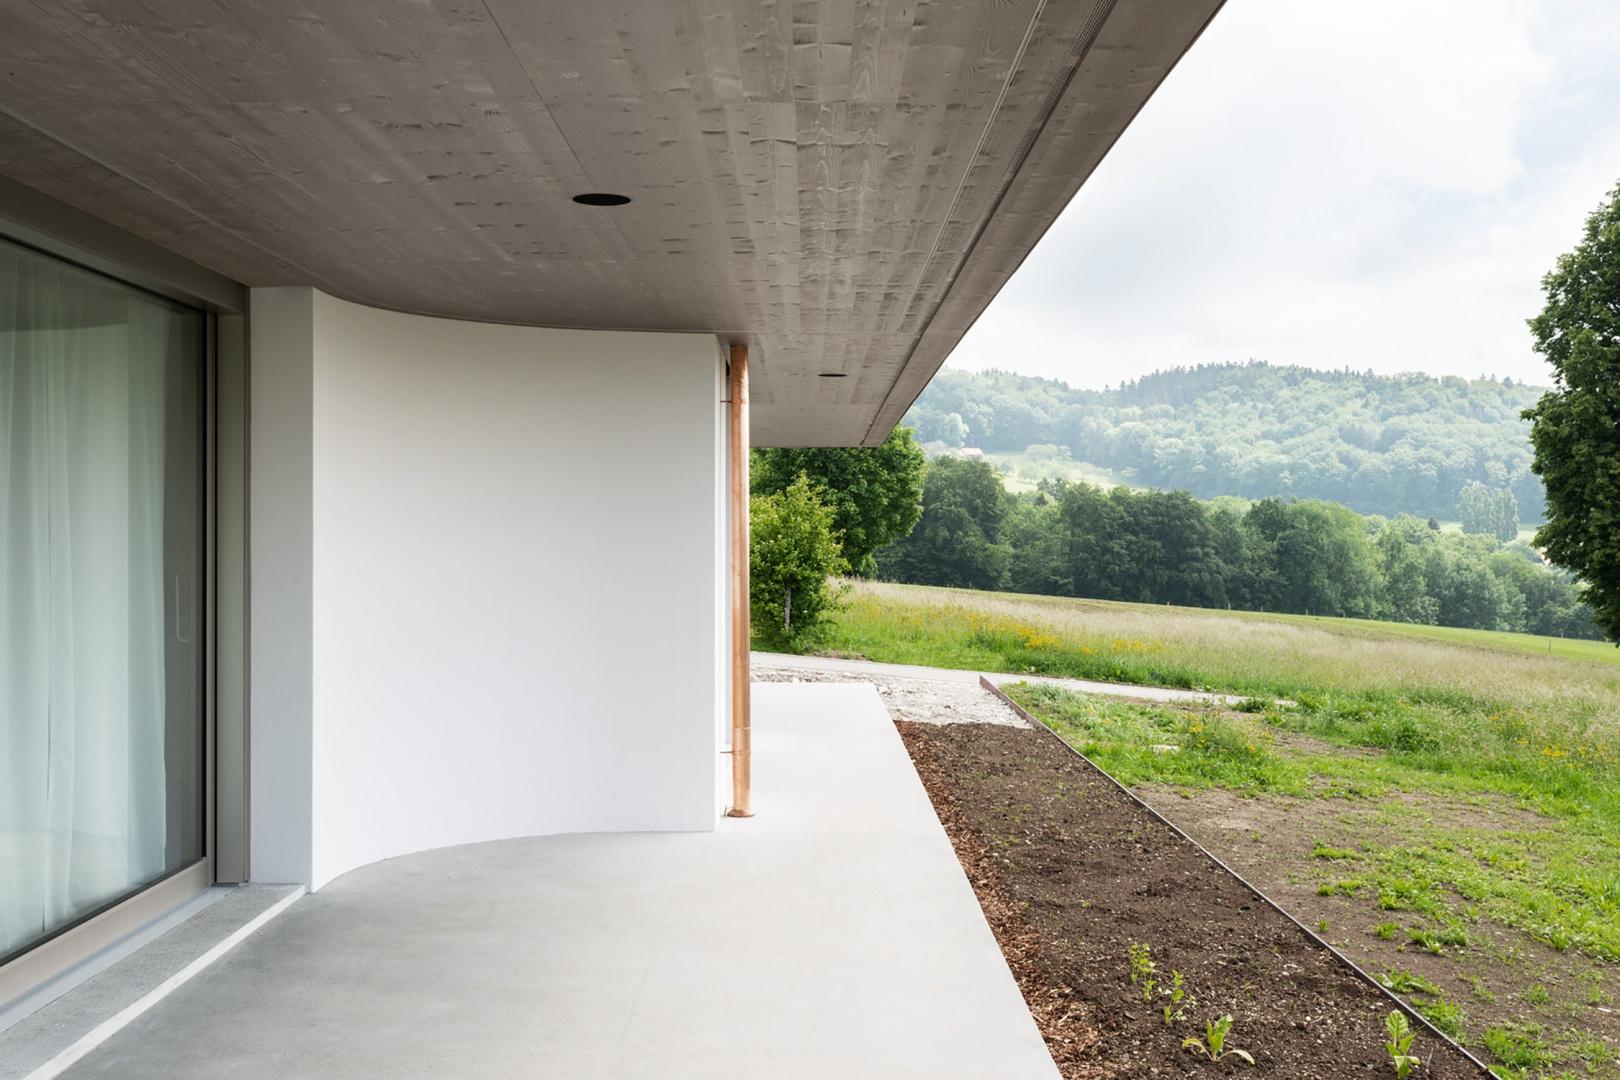 Terrasse © HSB Architekten GmbH, Poststrasse 1, 4500 Solothurn